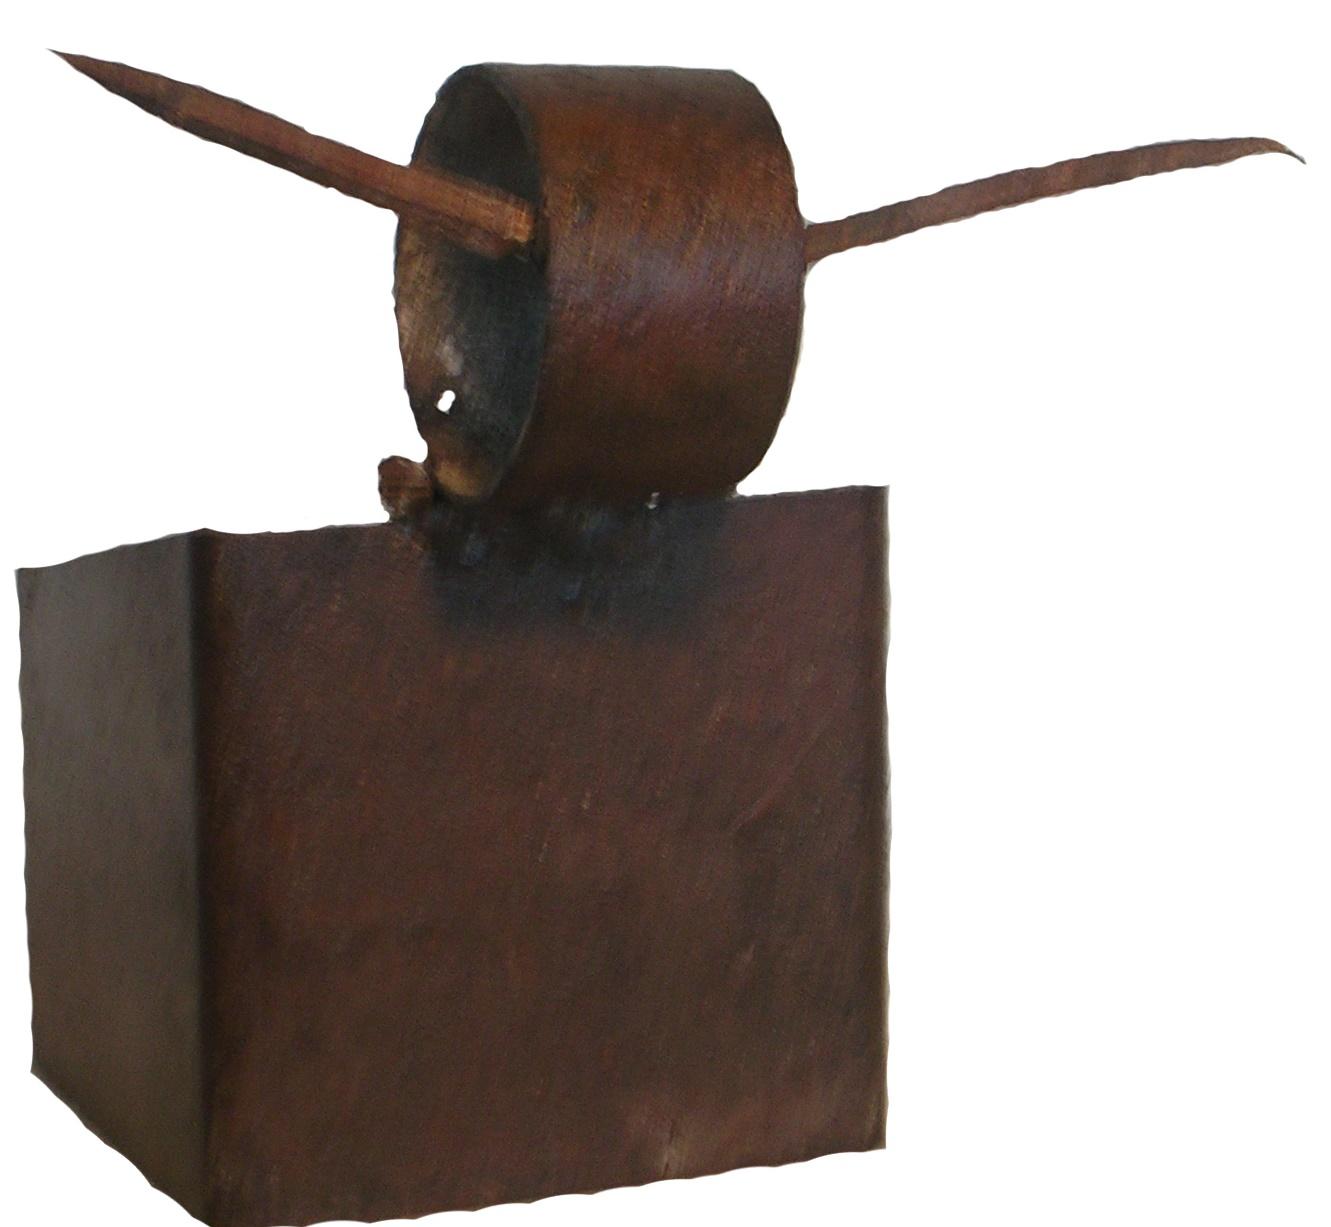 Toro espinoso